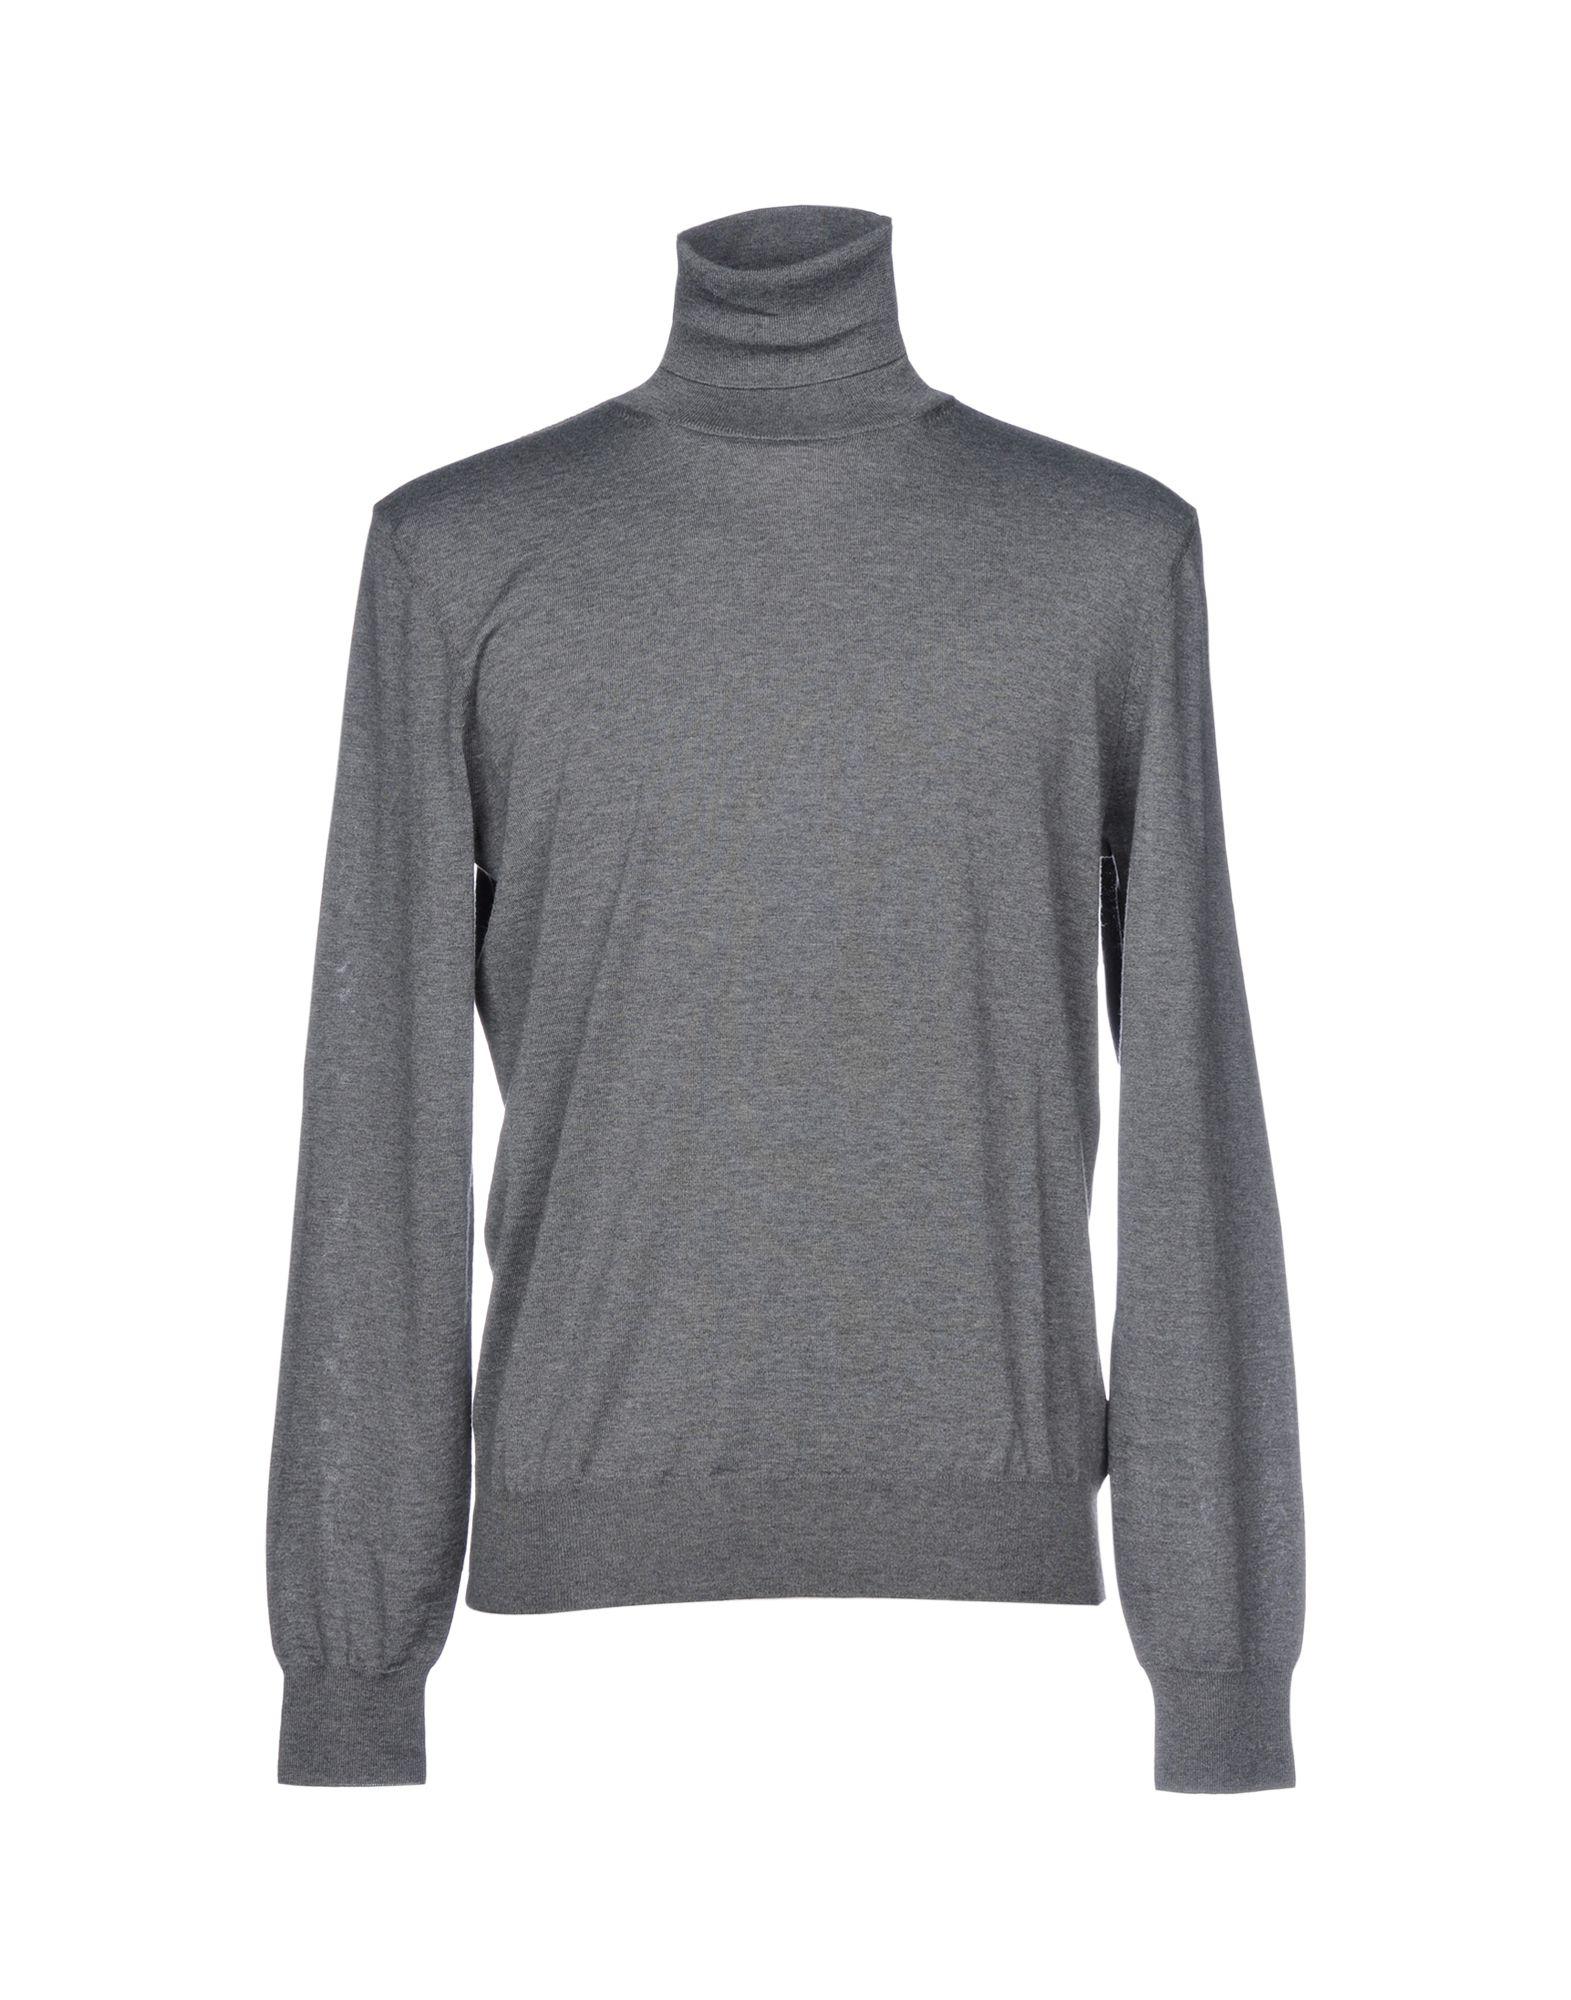 FAÇONNABLE Turtleneck in Grey